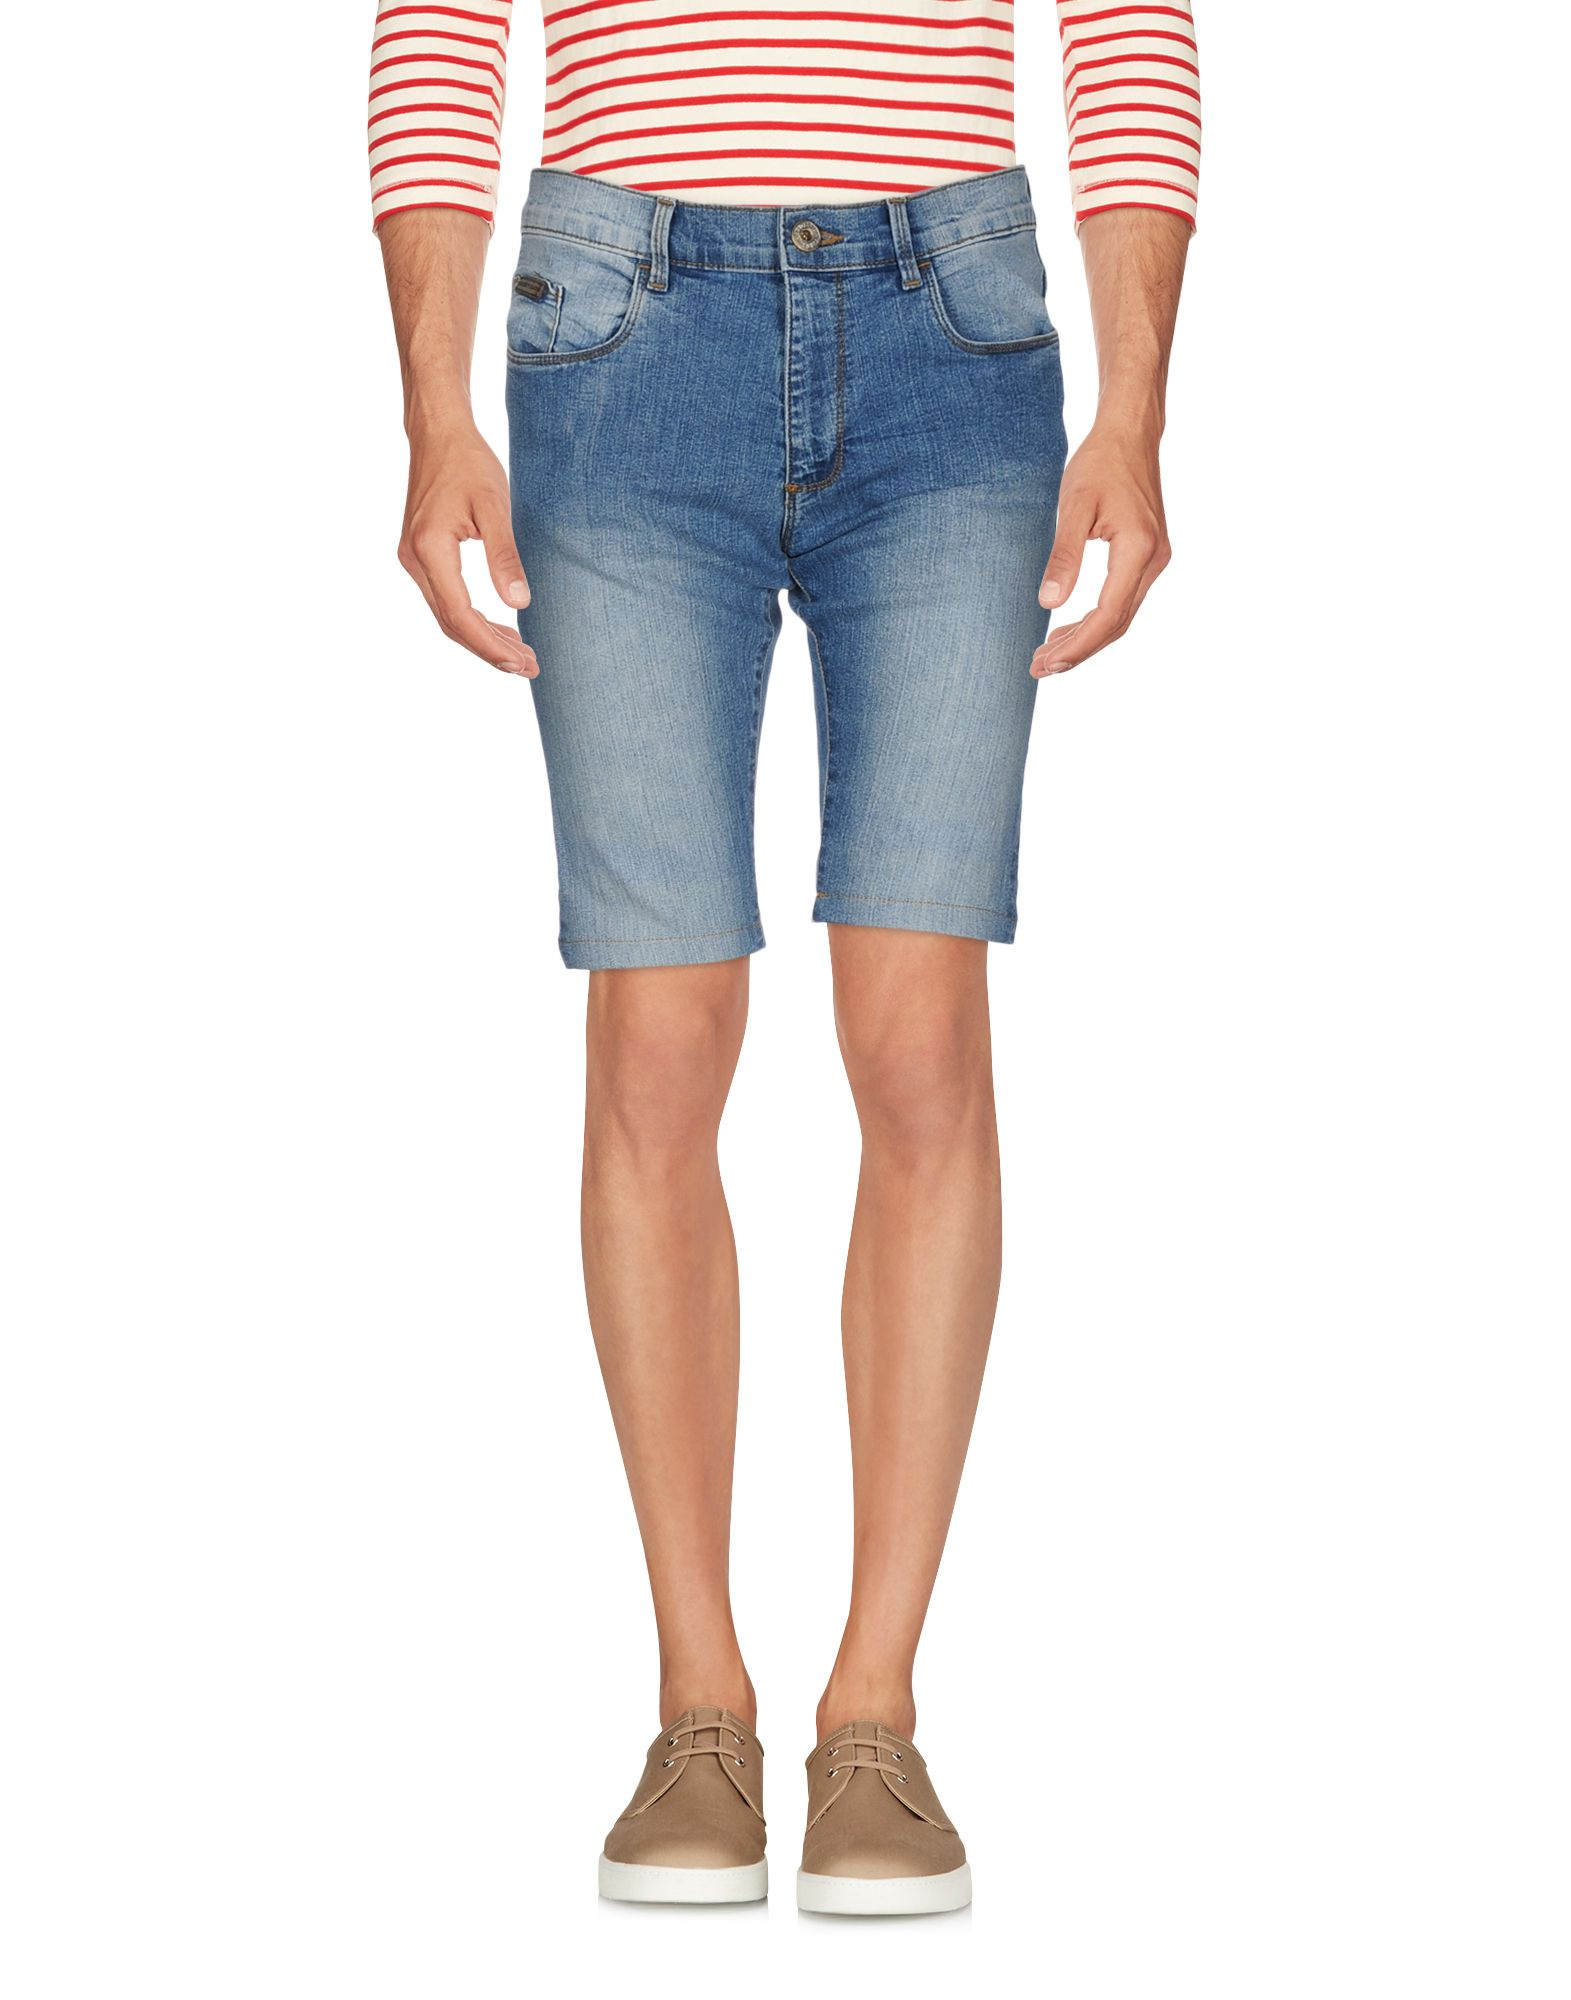 TRUSSARDI JEANS Джинсовые бермуды masons jeans джинсовые бермуды